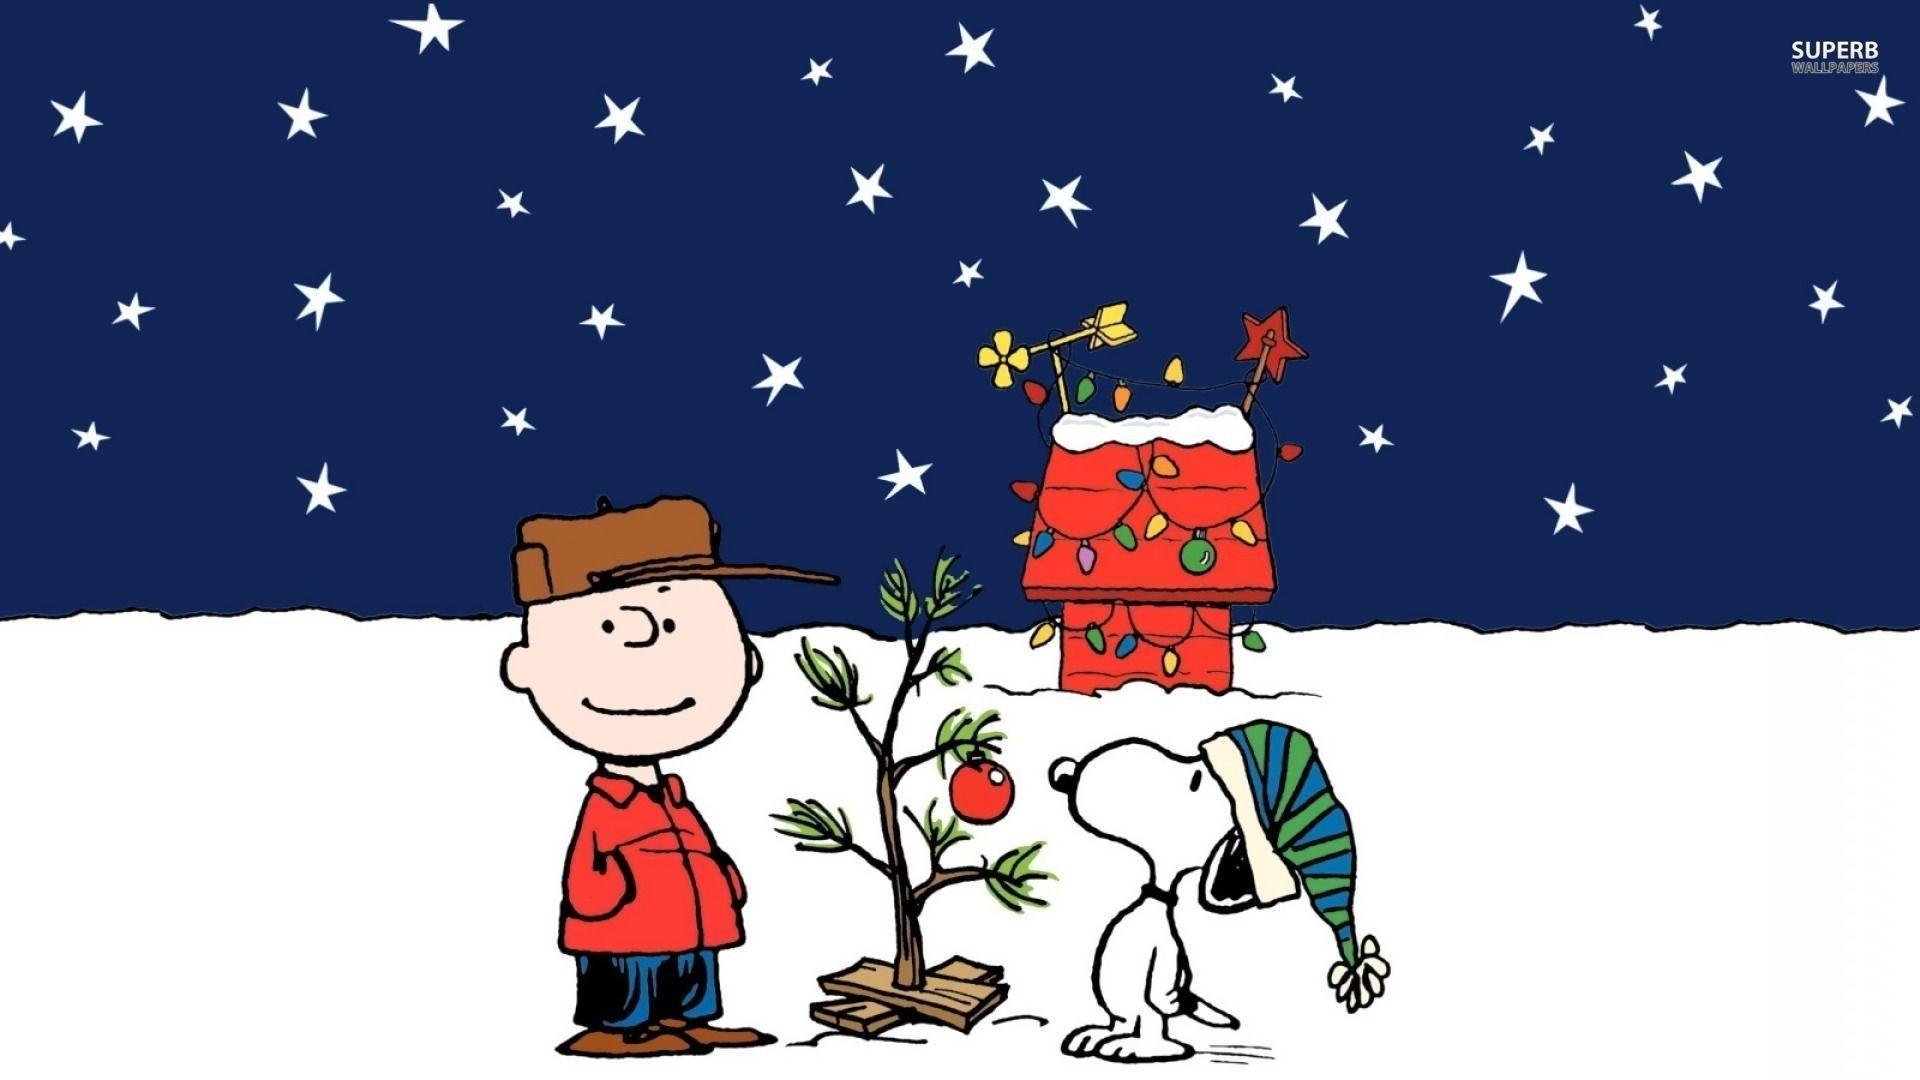 Peanuts Christmas Wallpapers - Top Free Peanuts Christmas ...